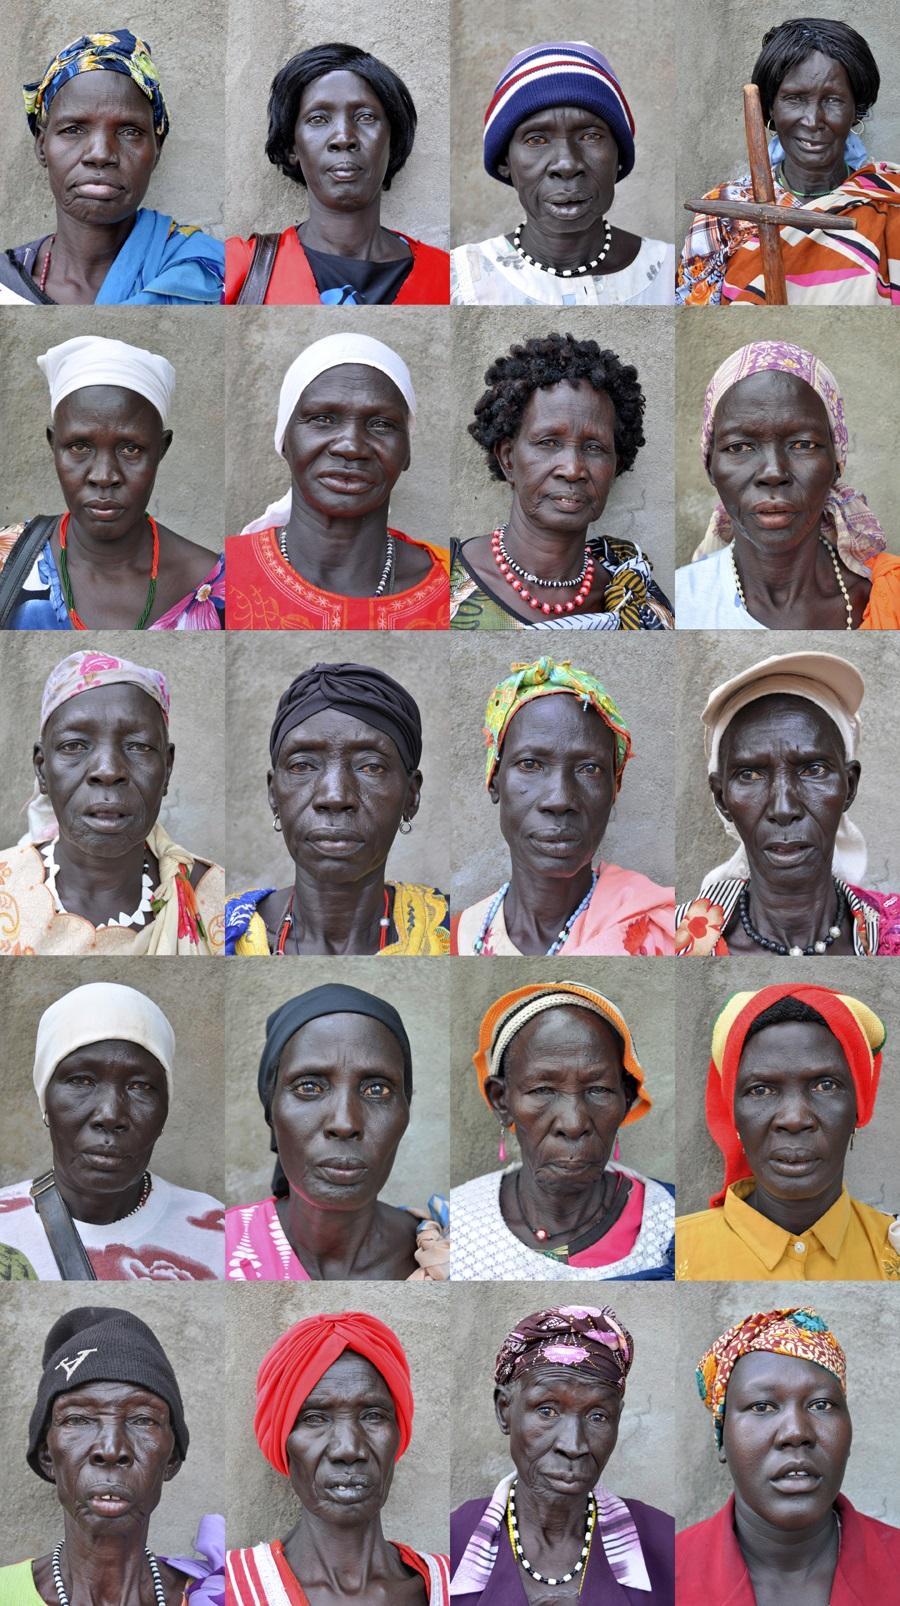 South Sudan, 2011, documentary